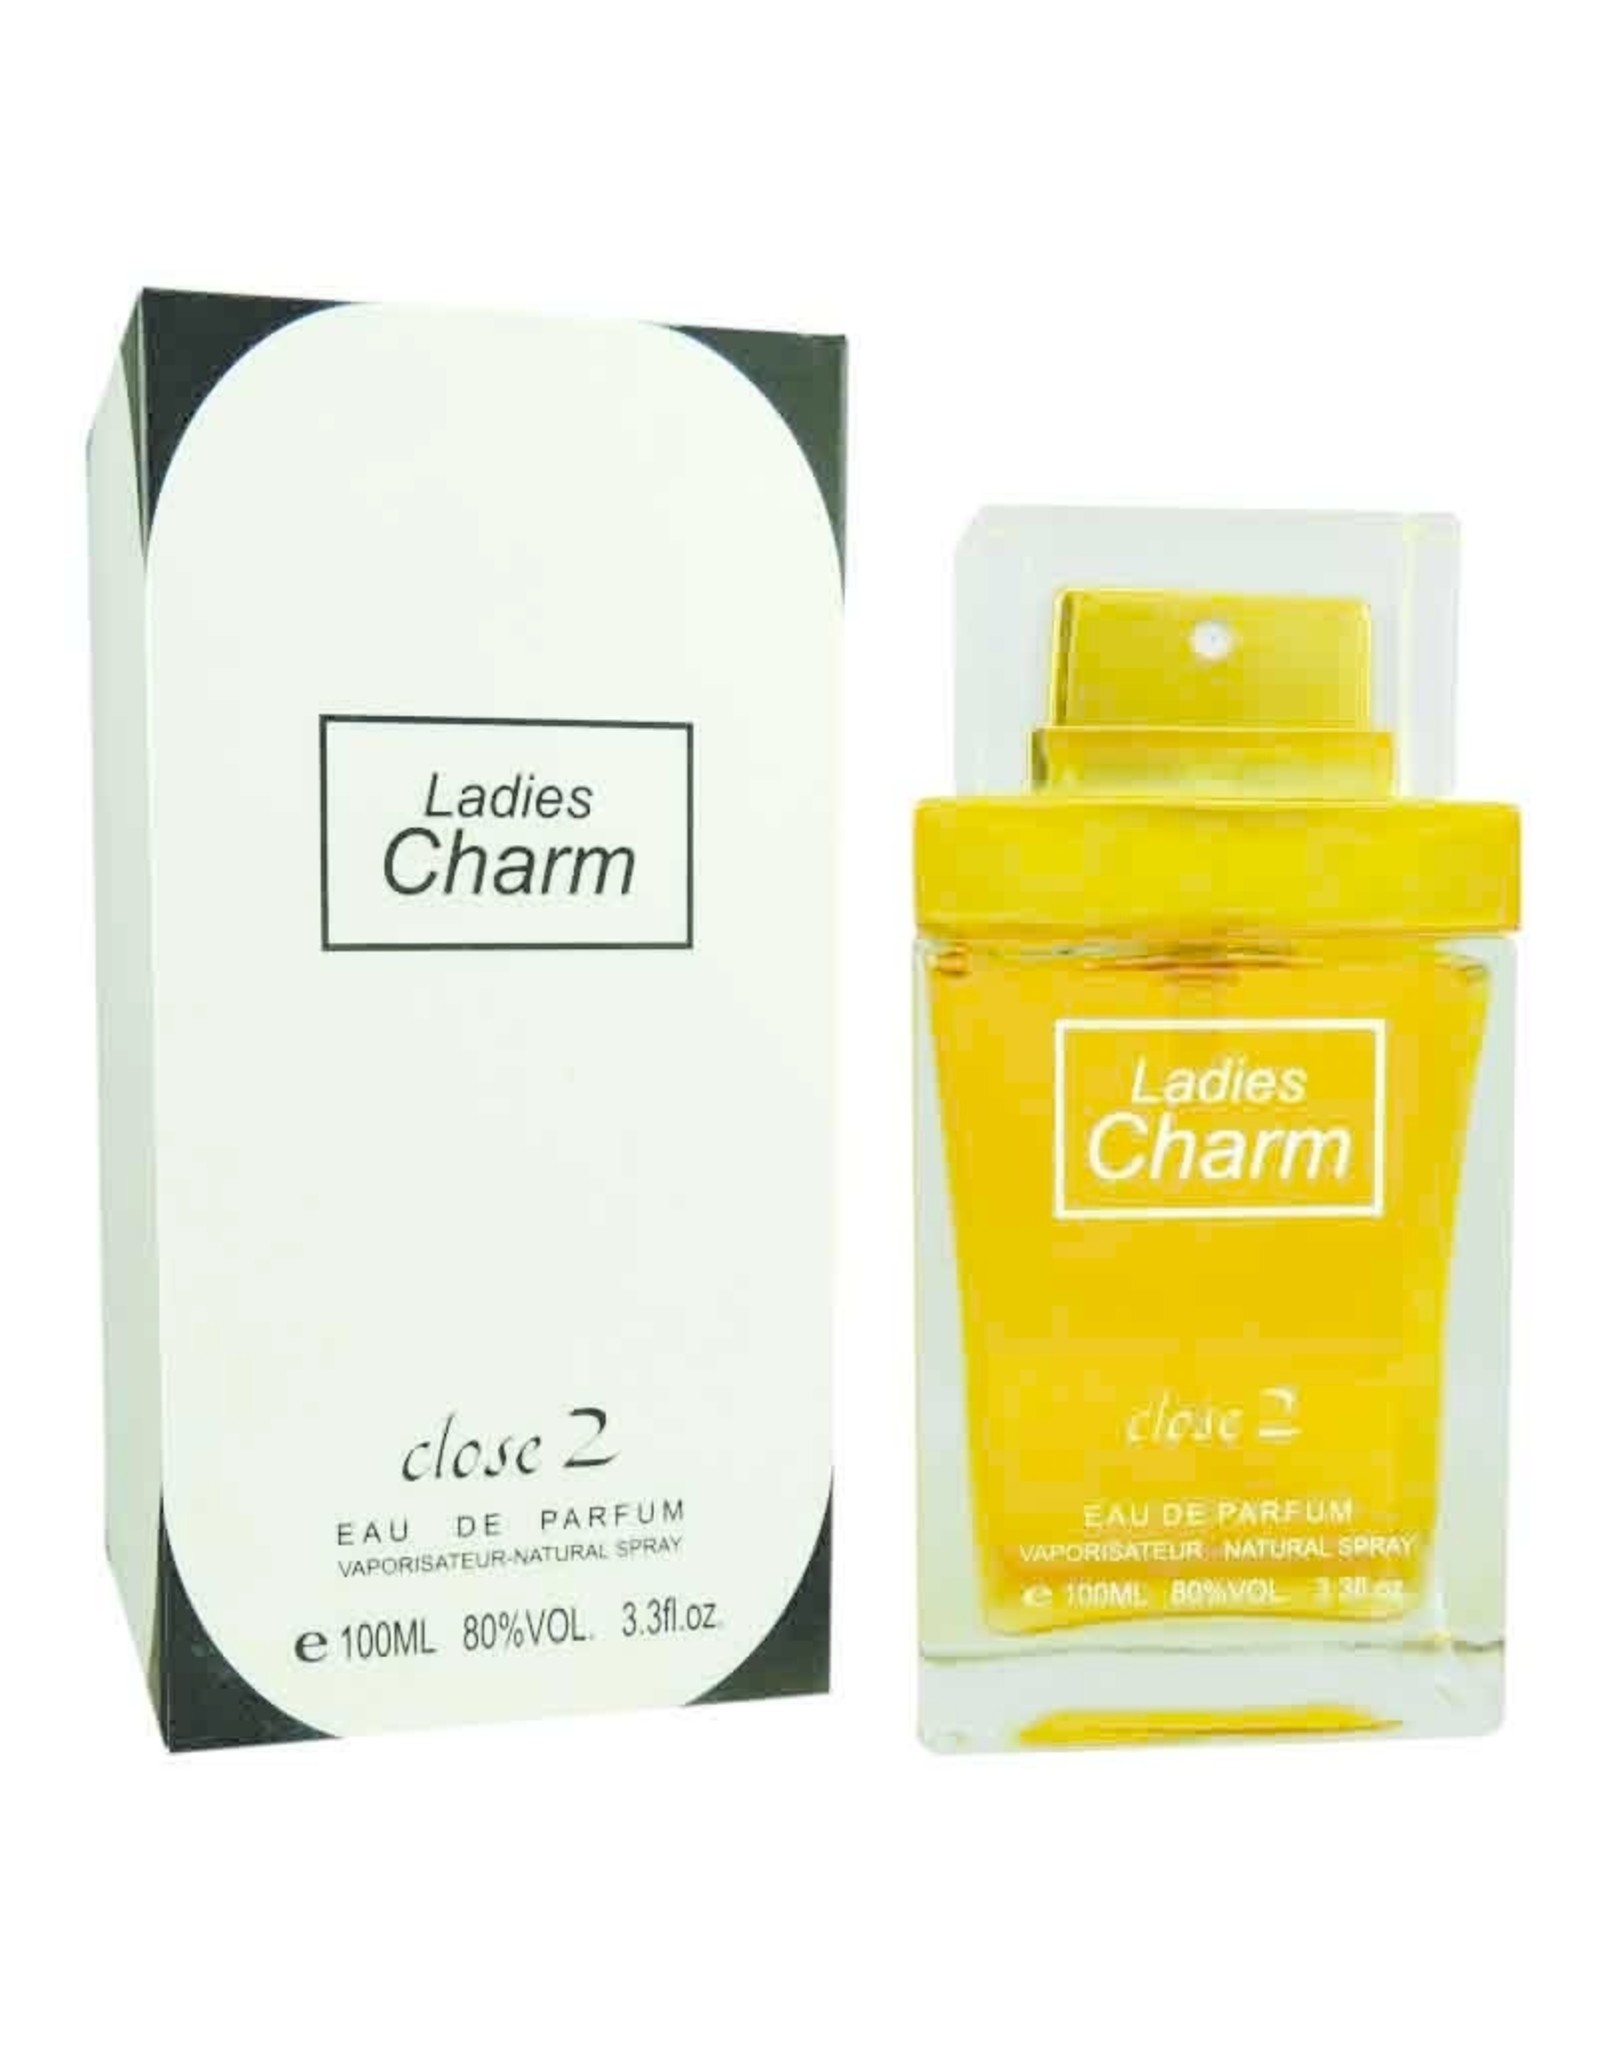 Close 2 parfums Ladies Charm EDP 100 ml